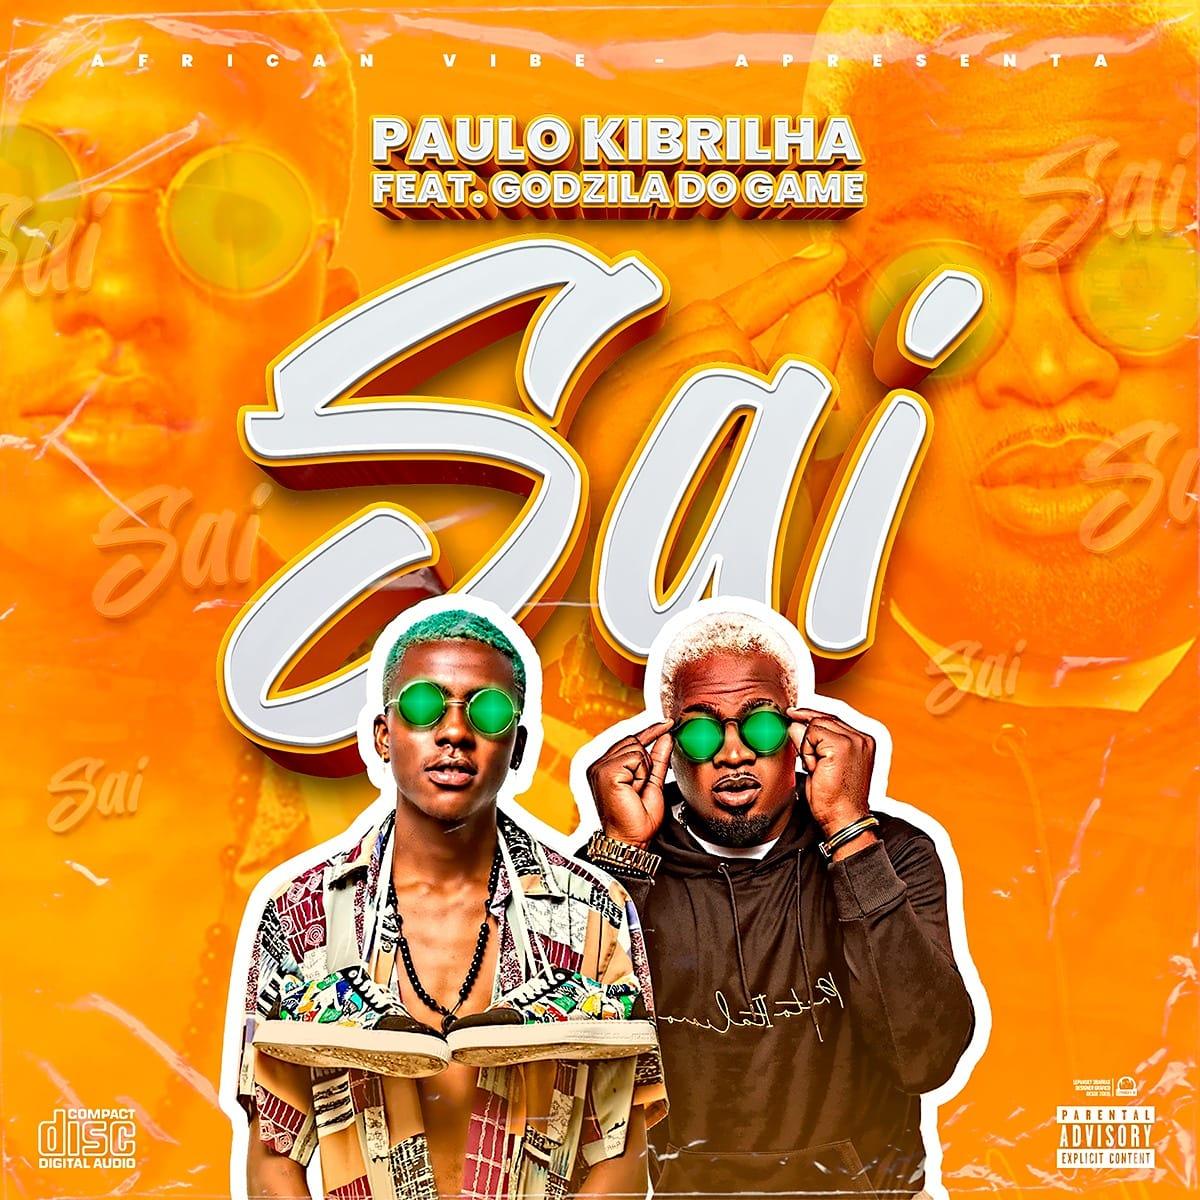 Paulo Kibrilha - Sai (feat. Godzila Do Game)